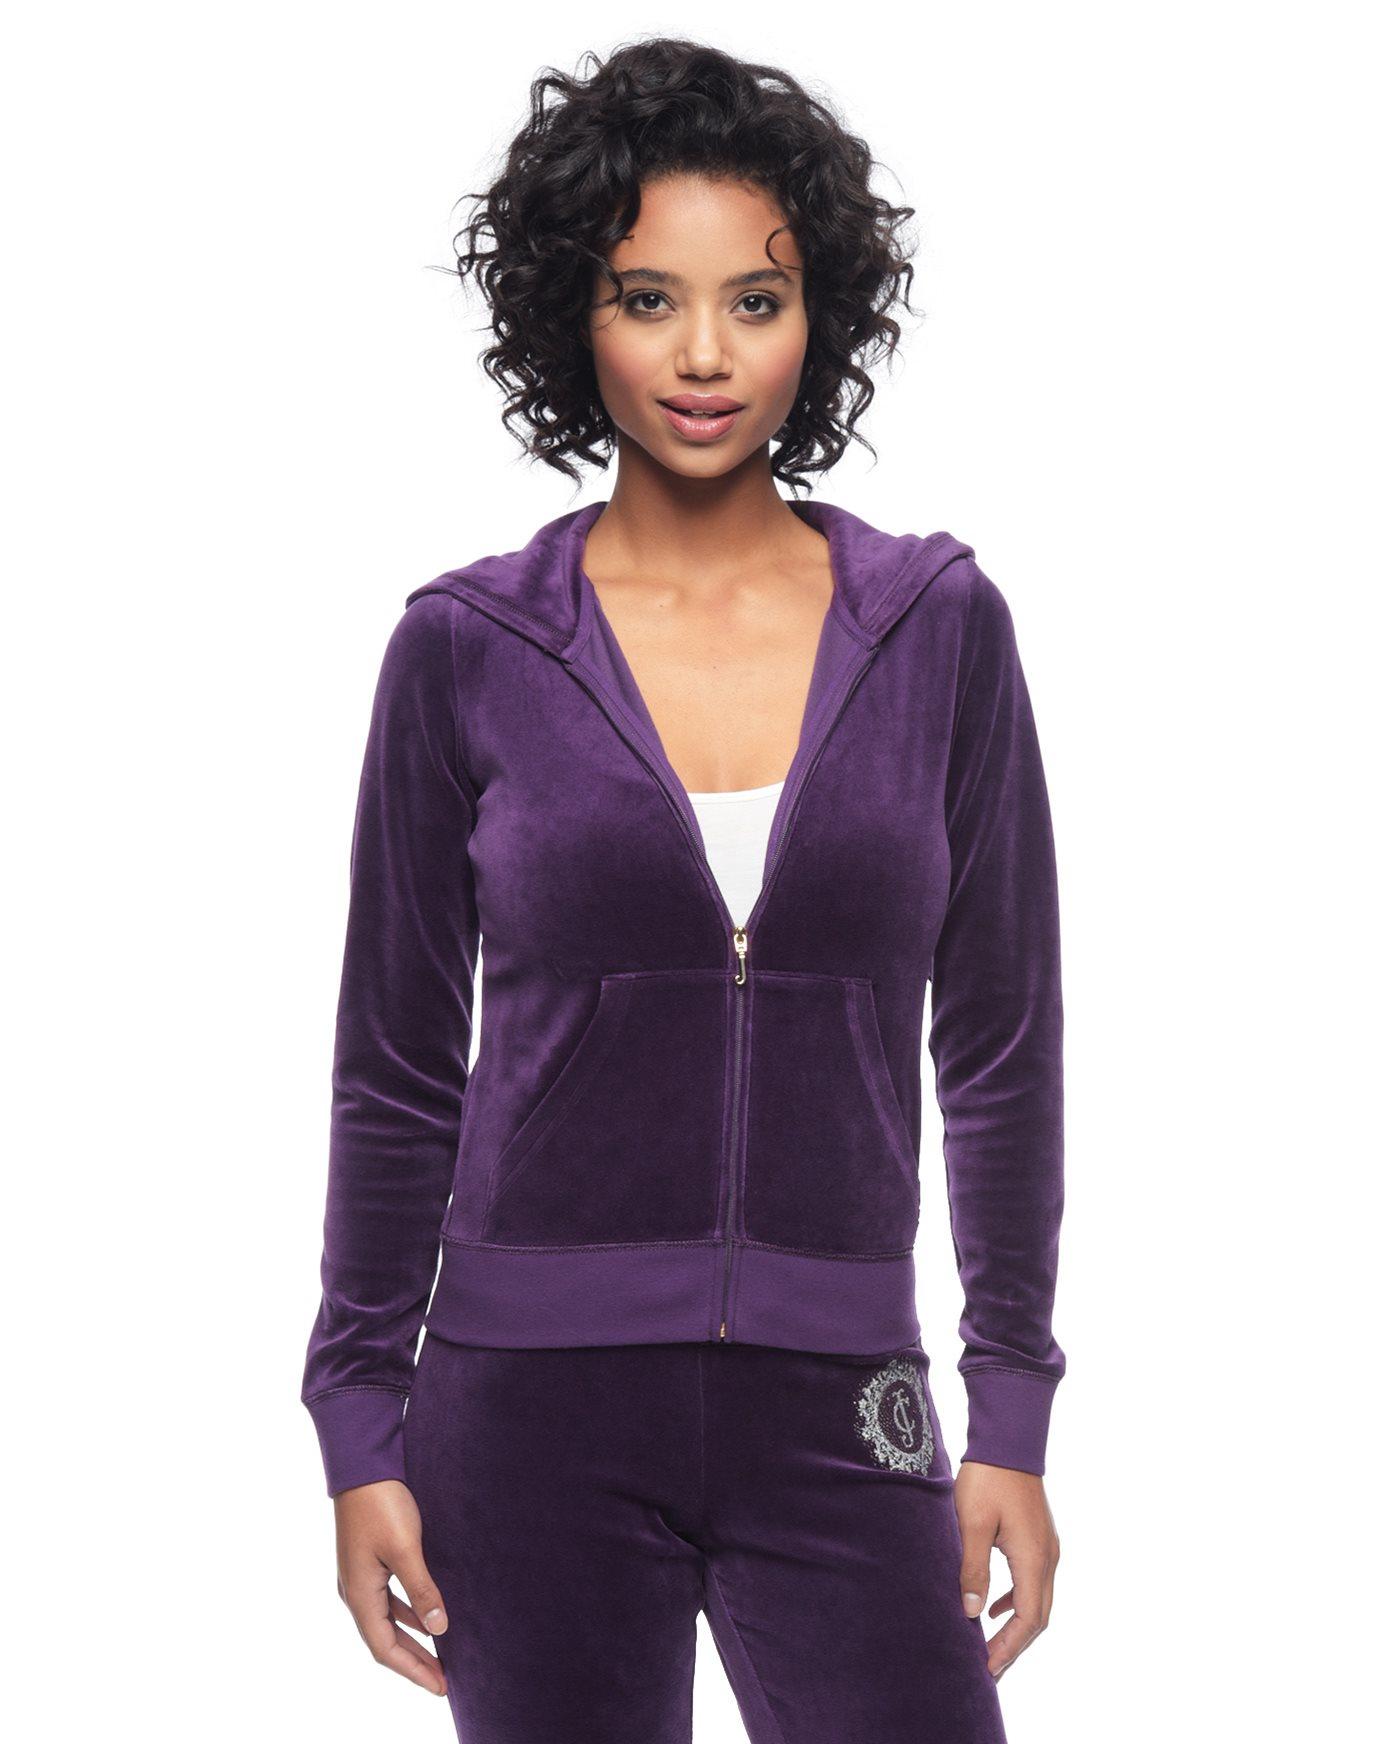 Juicy couture Logo Jc Crystals Velour Original Jacket in ...